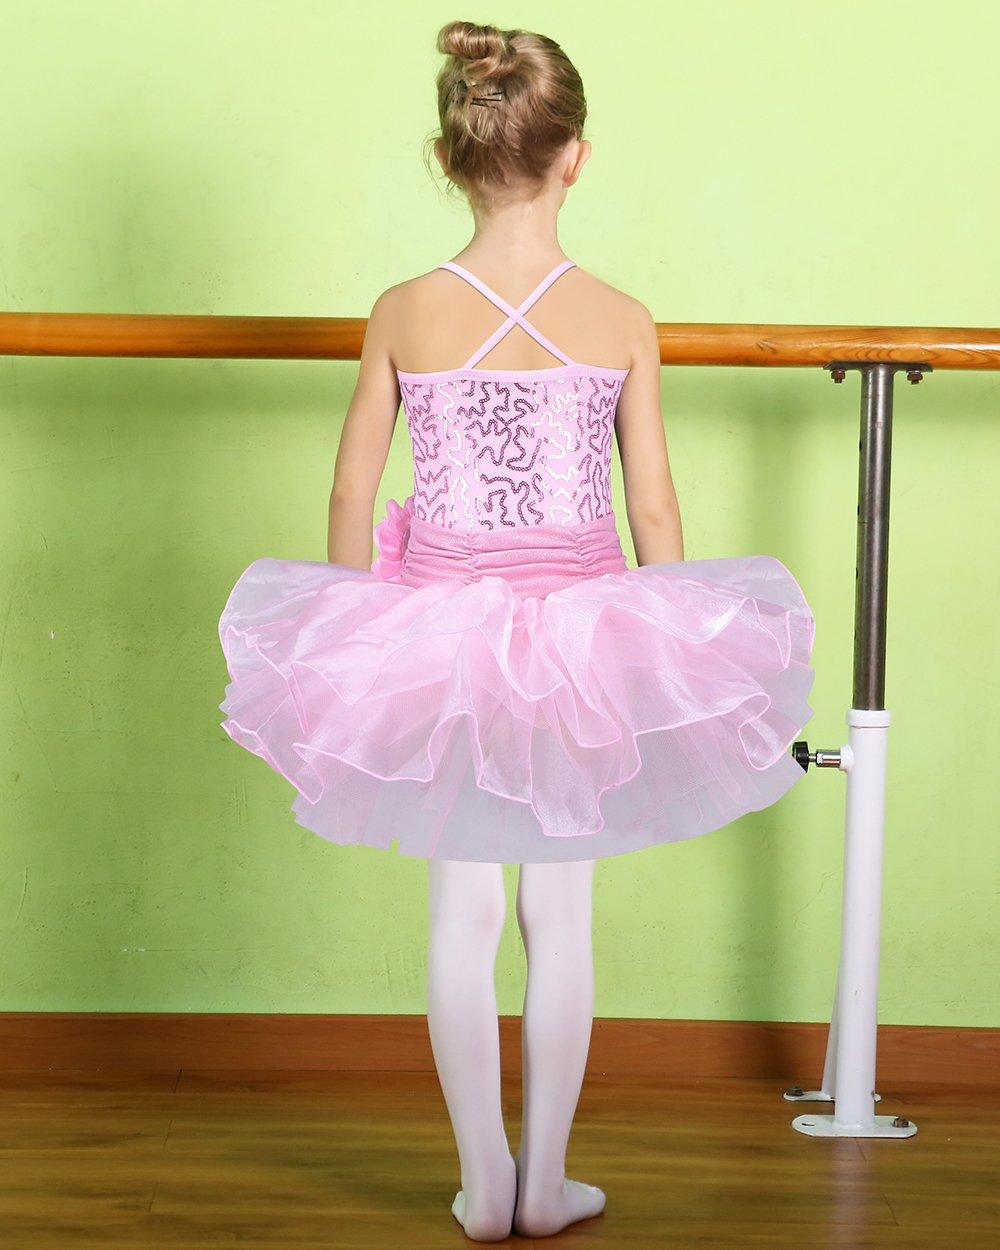 8acee0697 Amazon.com  BAOHULU  Ballet dance leotards